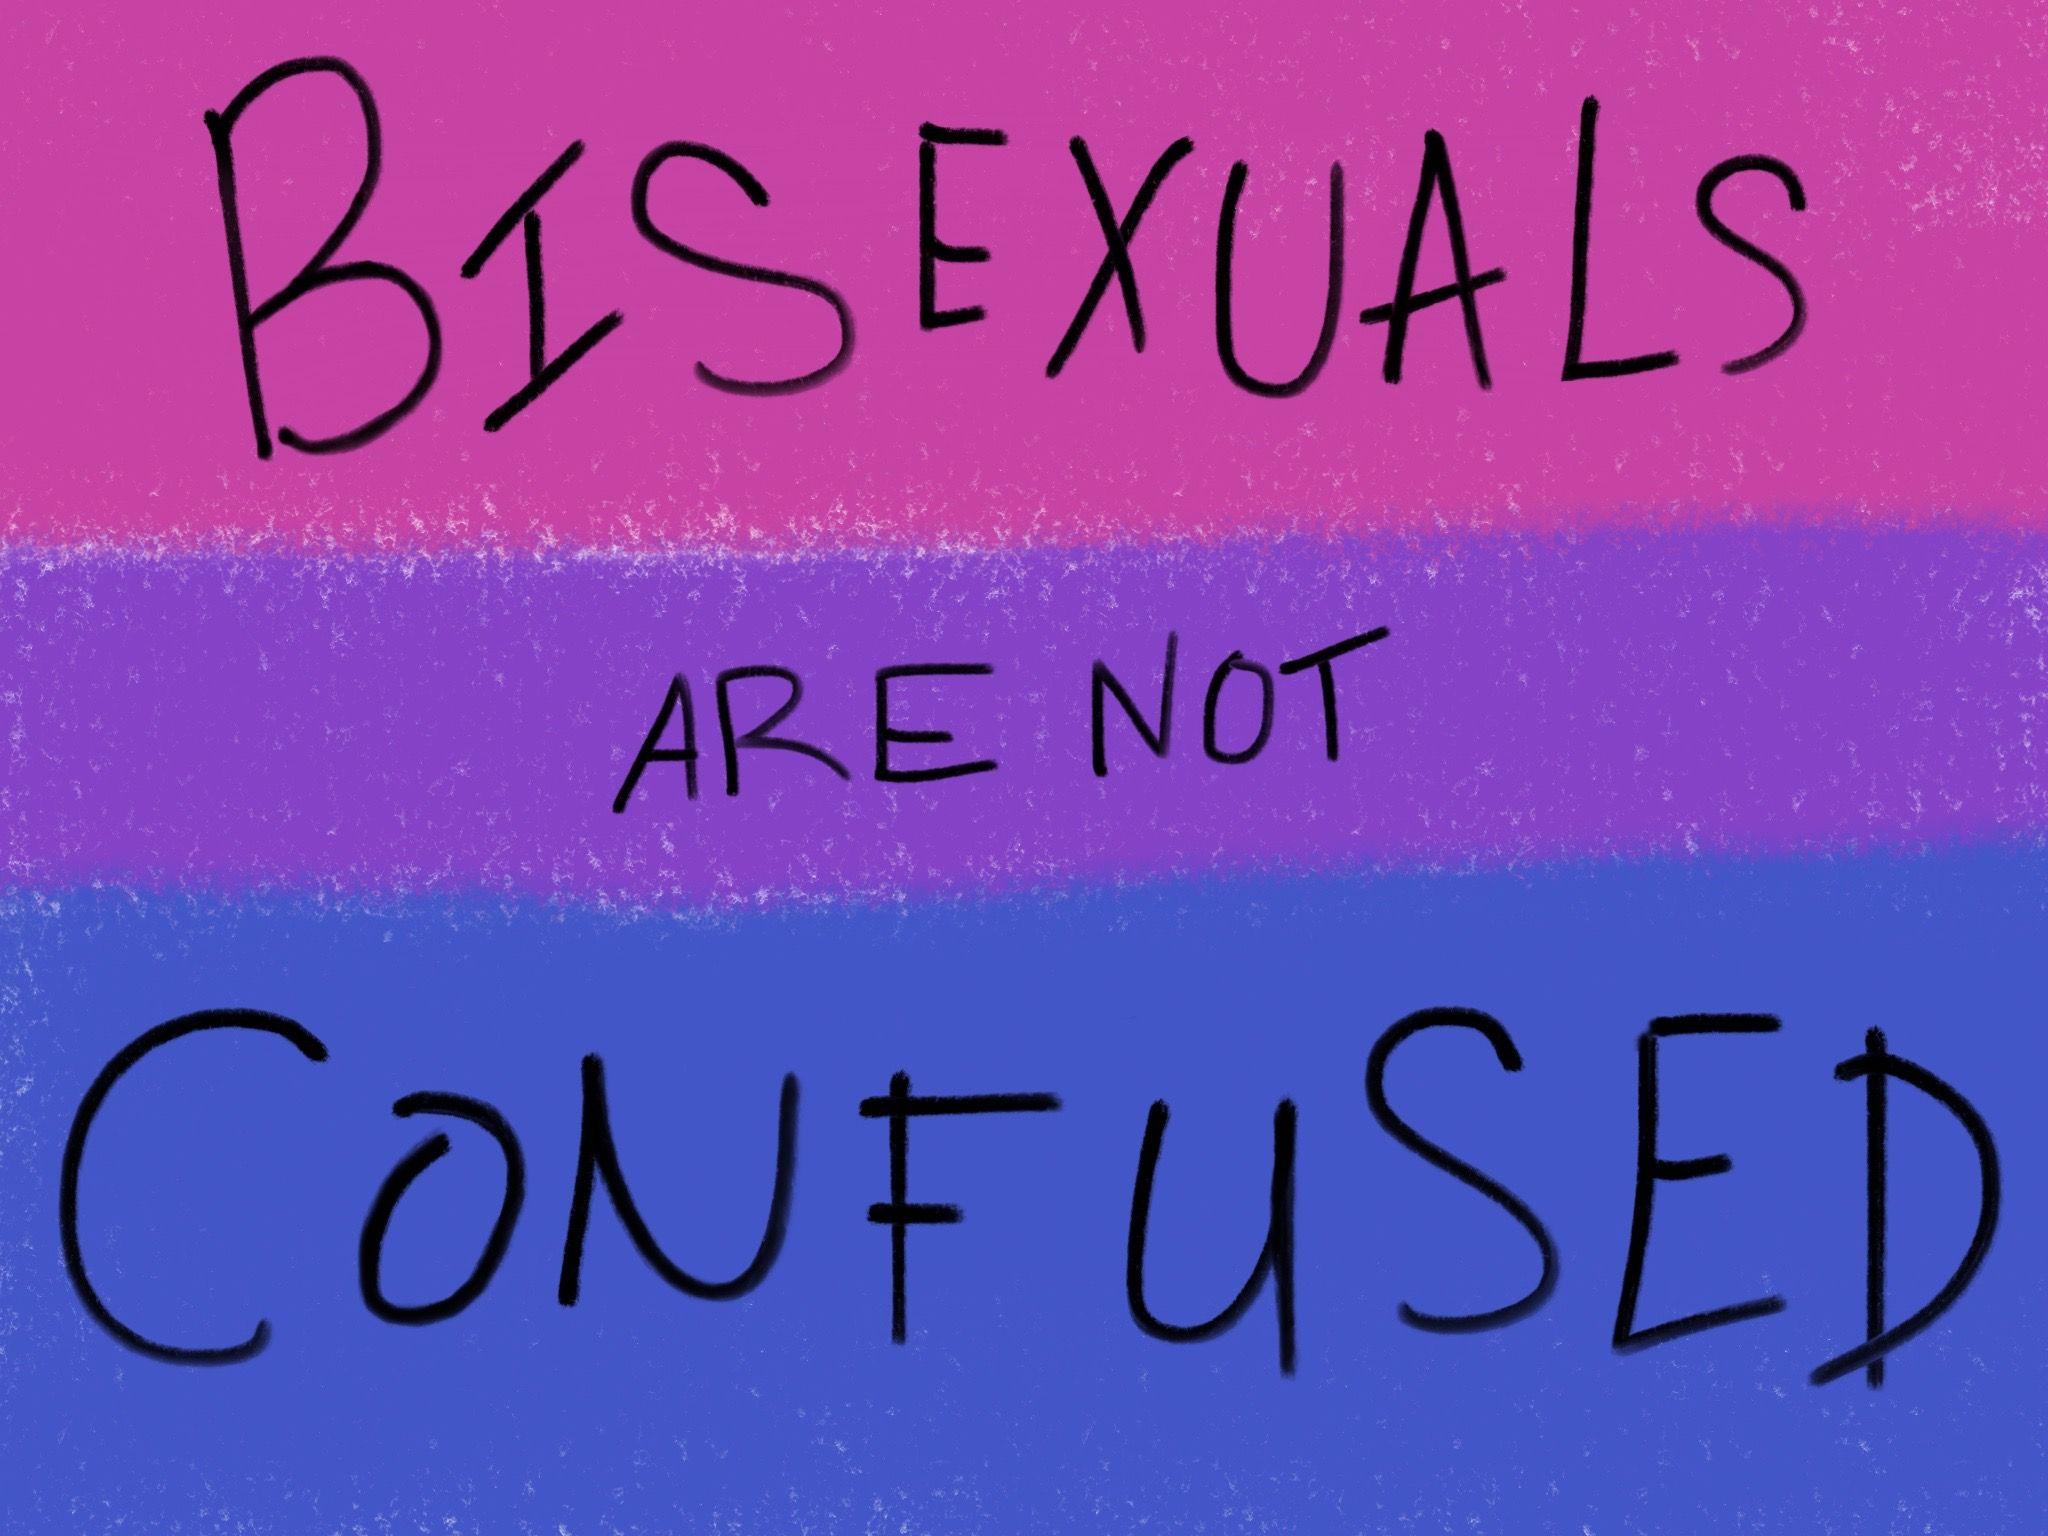 Bisexual information #7